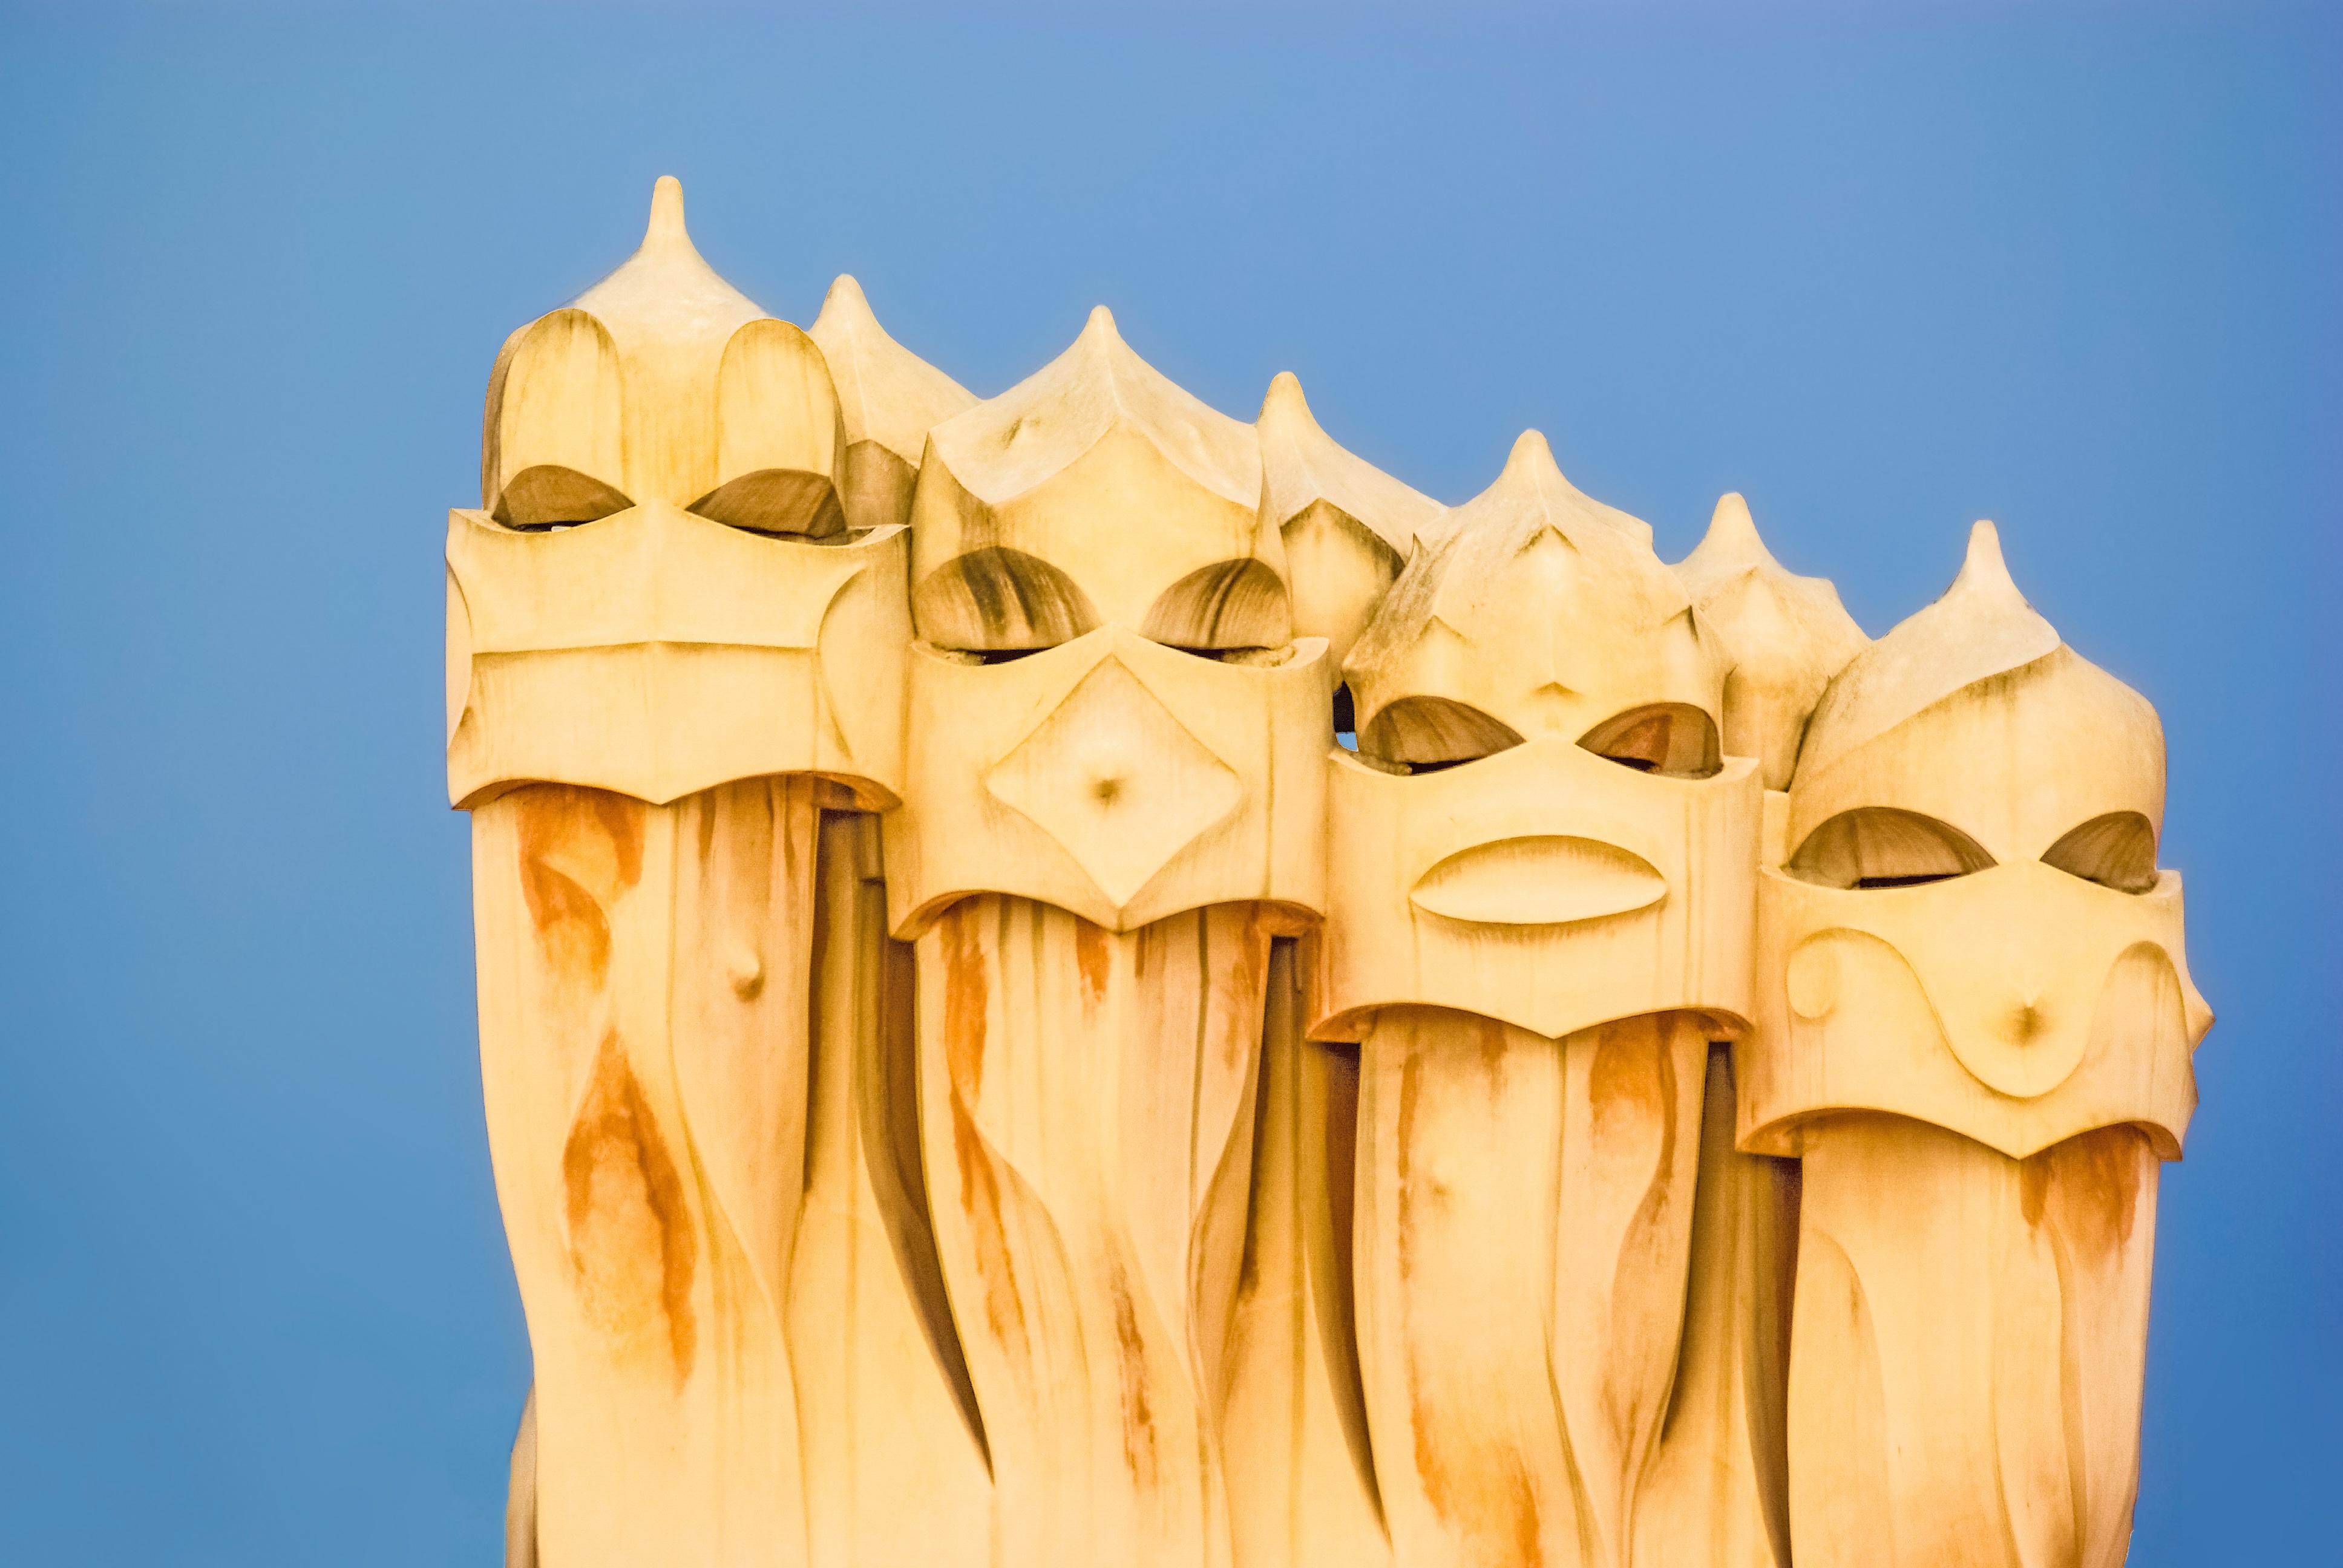 madera barcelona escultura art espaa ilustracin templo catalunya catalua gaud tallado casa mila lugar de